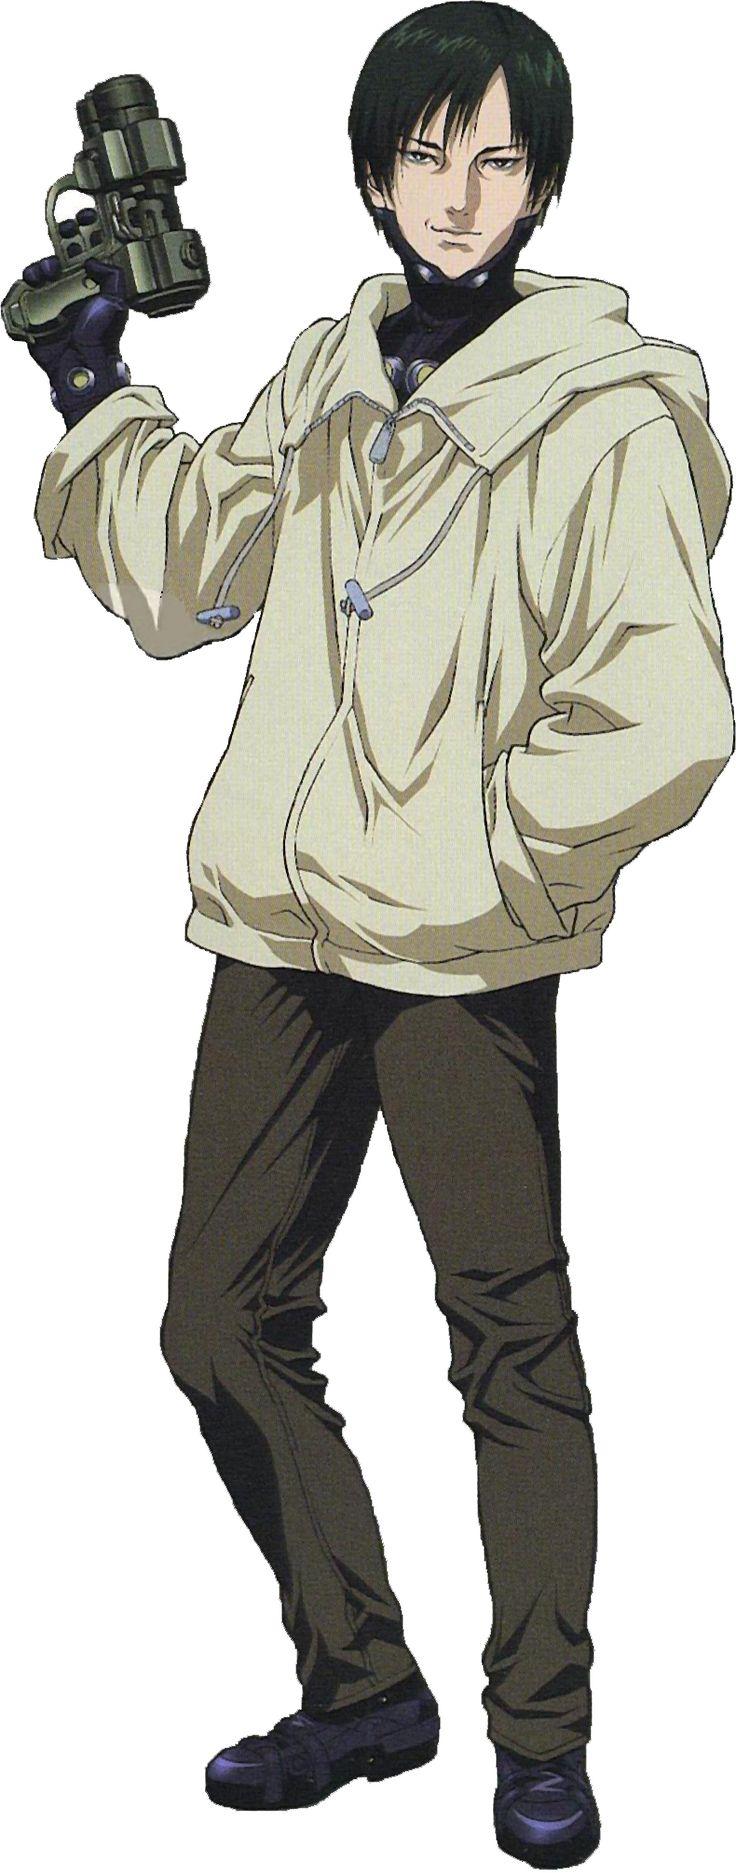 Joichero Nishi from Gantz   Personagens de anime, Anime, Manga